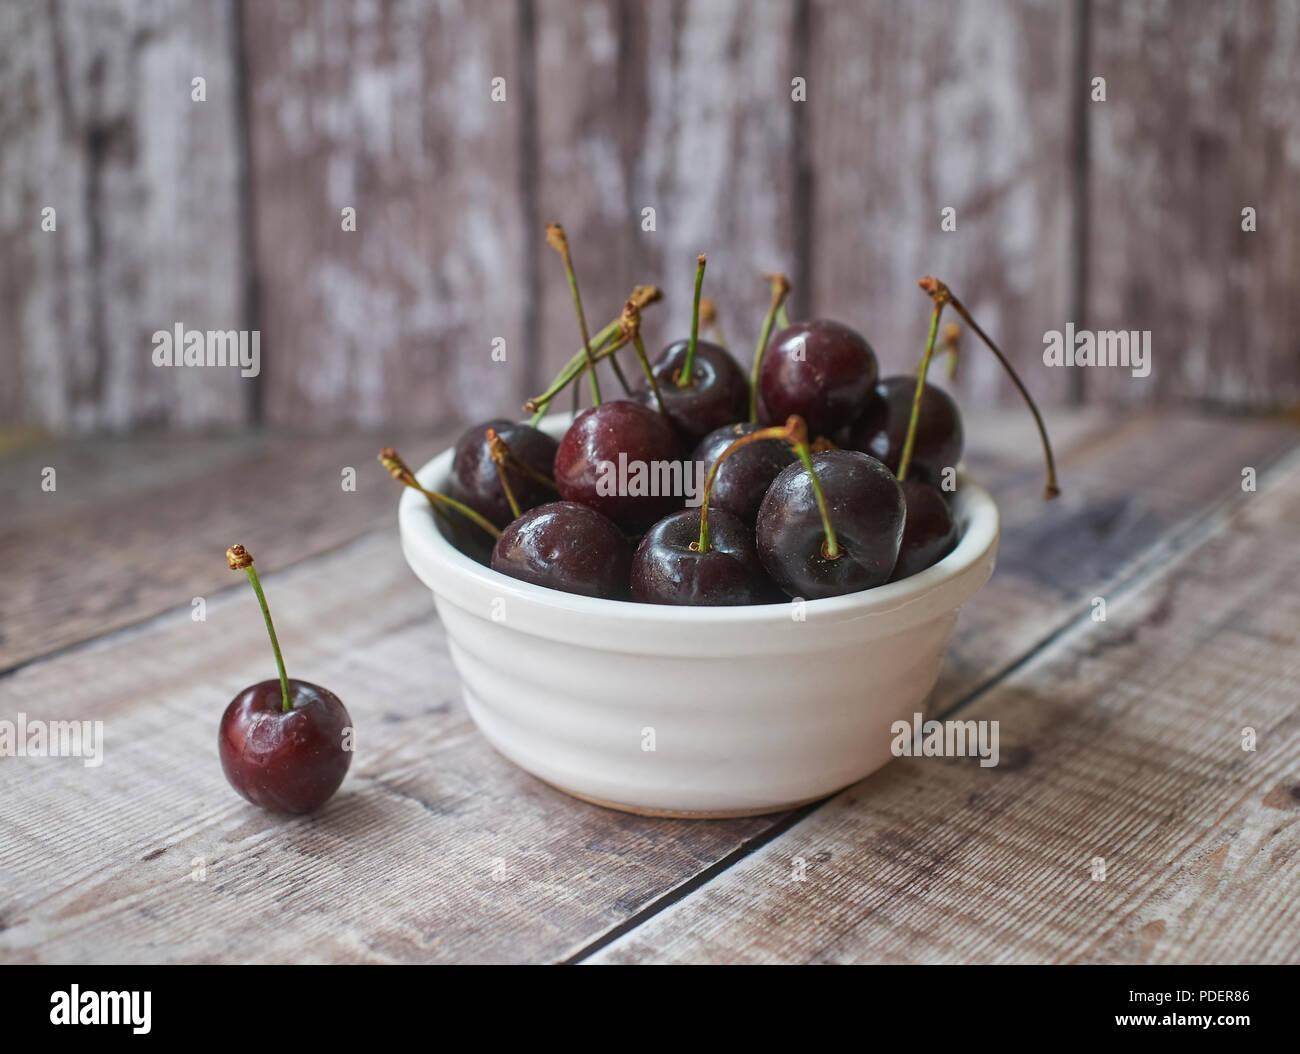 Appetizing Fresh Morello Cherries in white bowl on wooden table top - Stock Image